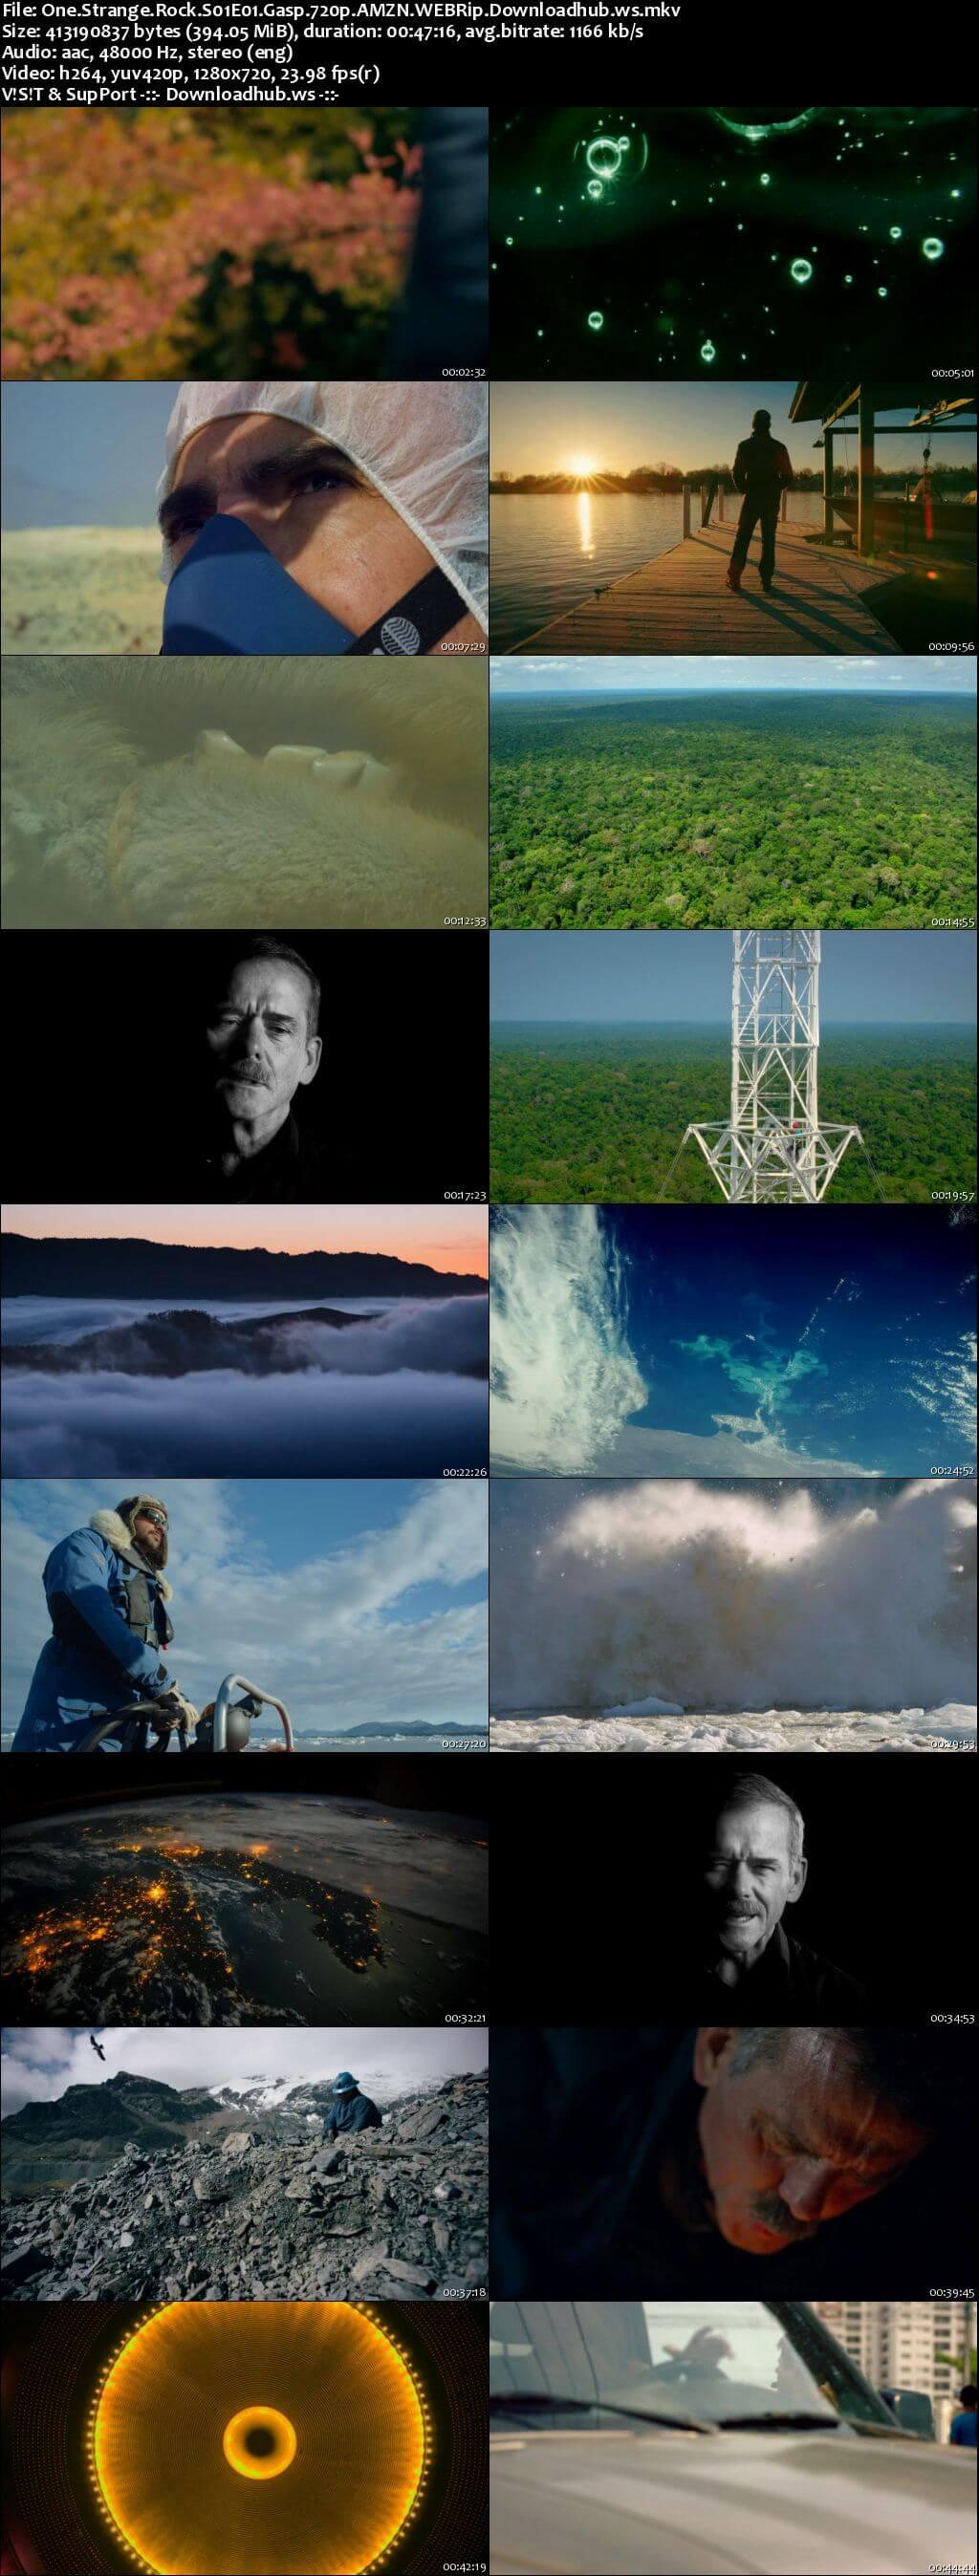 One Strange Rock S01E01 400MB WEBRip 720p x264